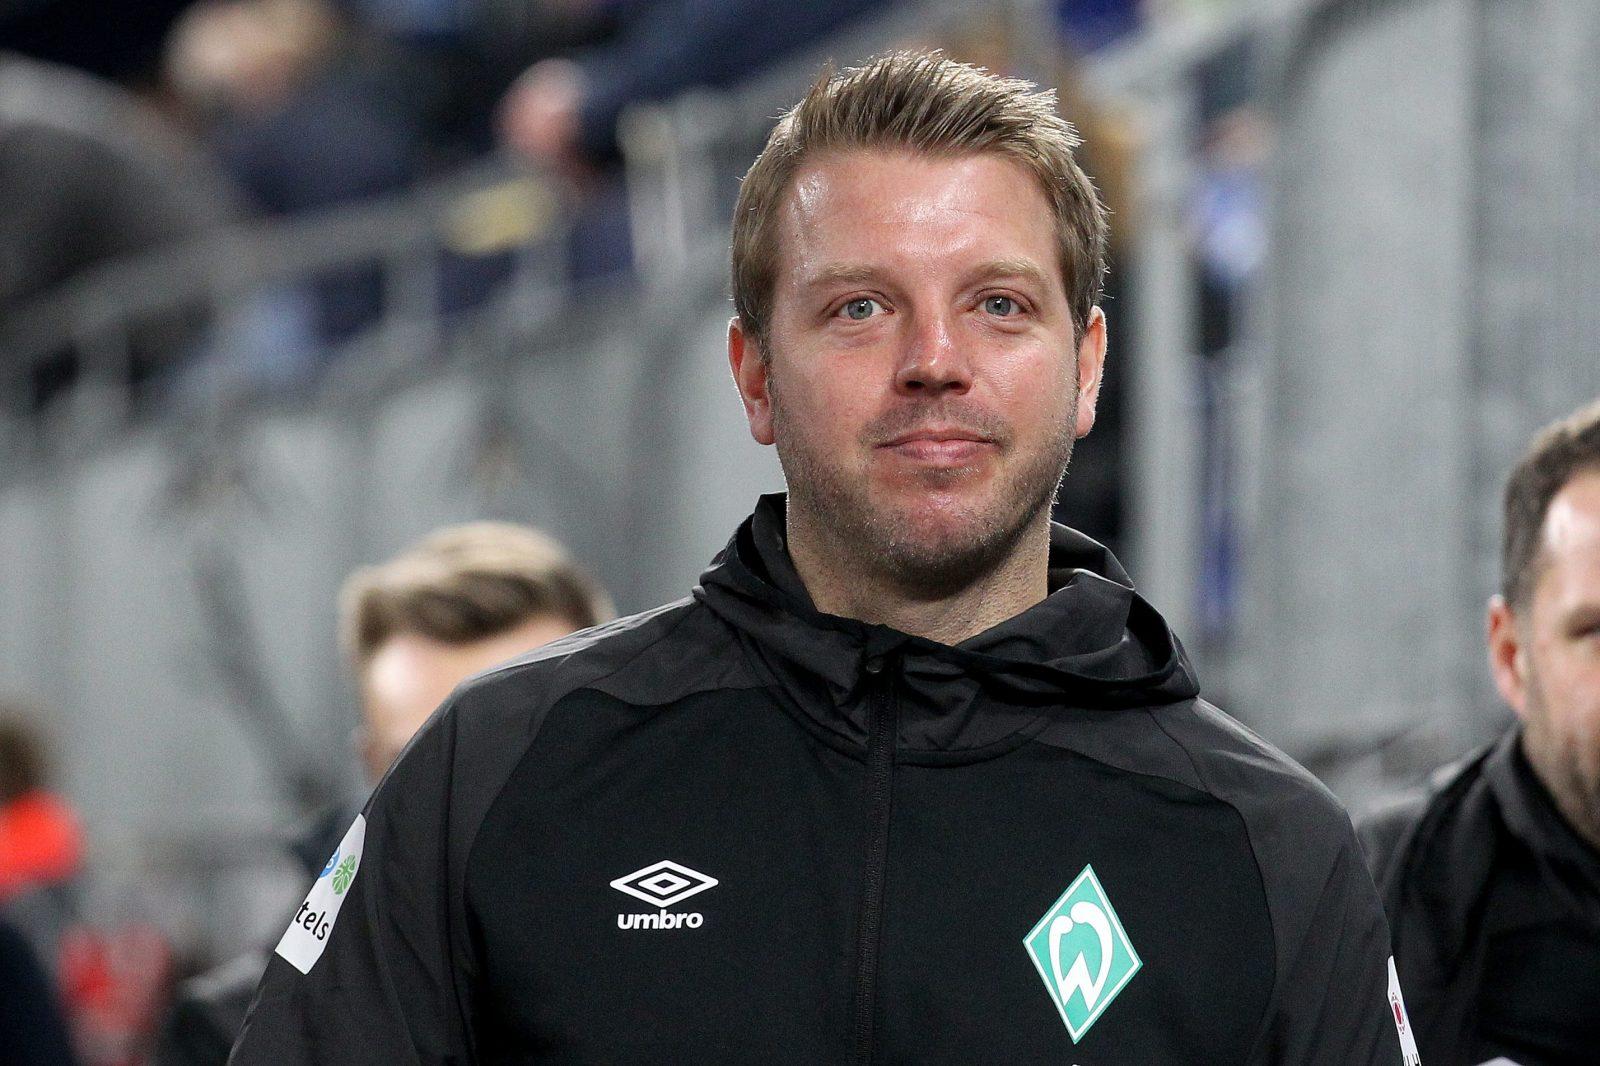 Florian Kohlfeldt